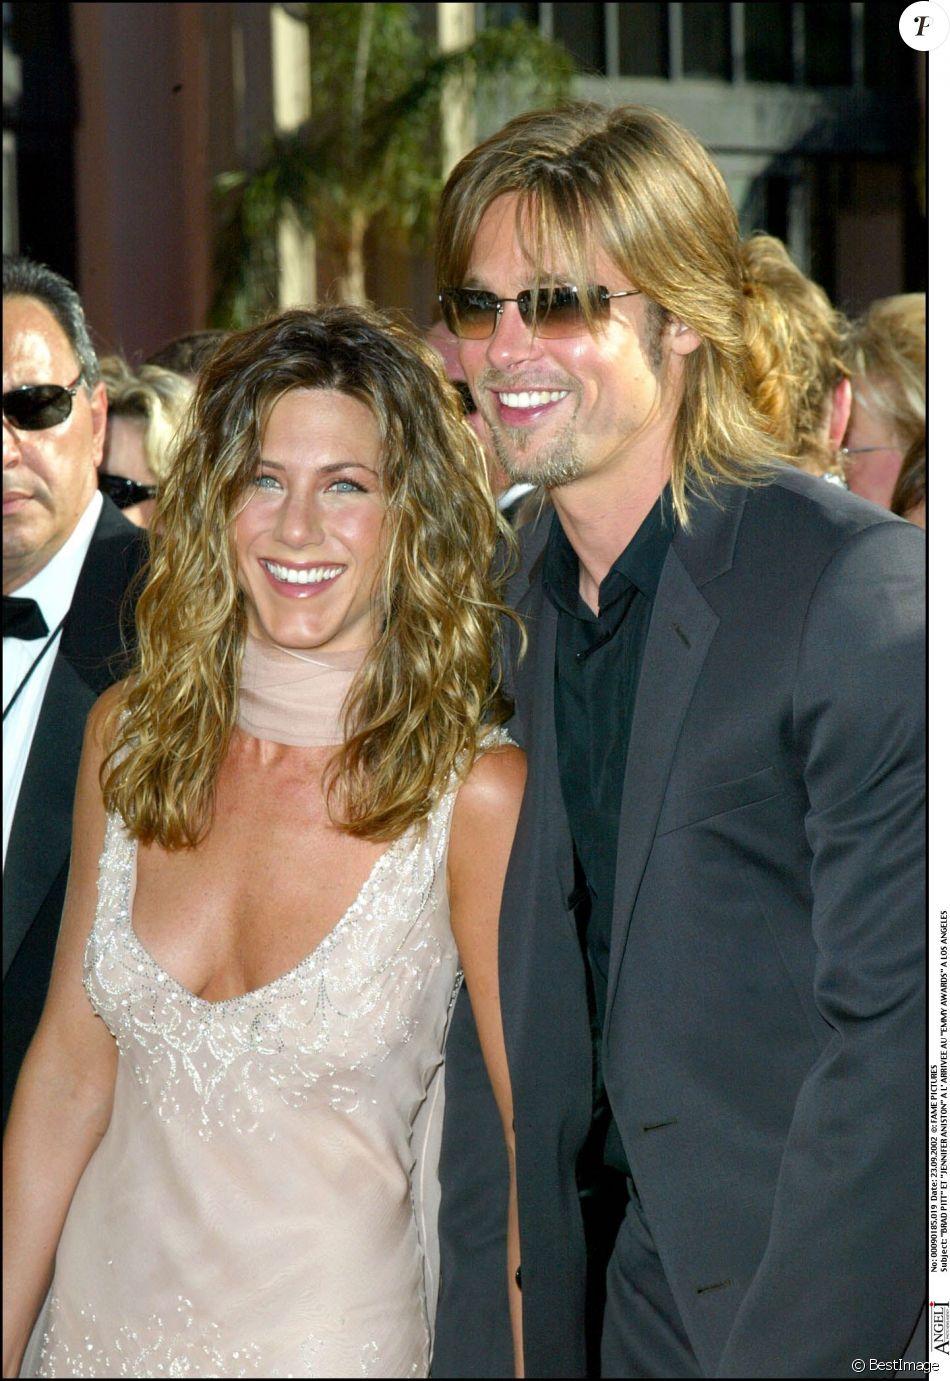 Jennifer Aniston Et Brad Pitt Aux Emmy Awards Los Angeles Le 23